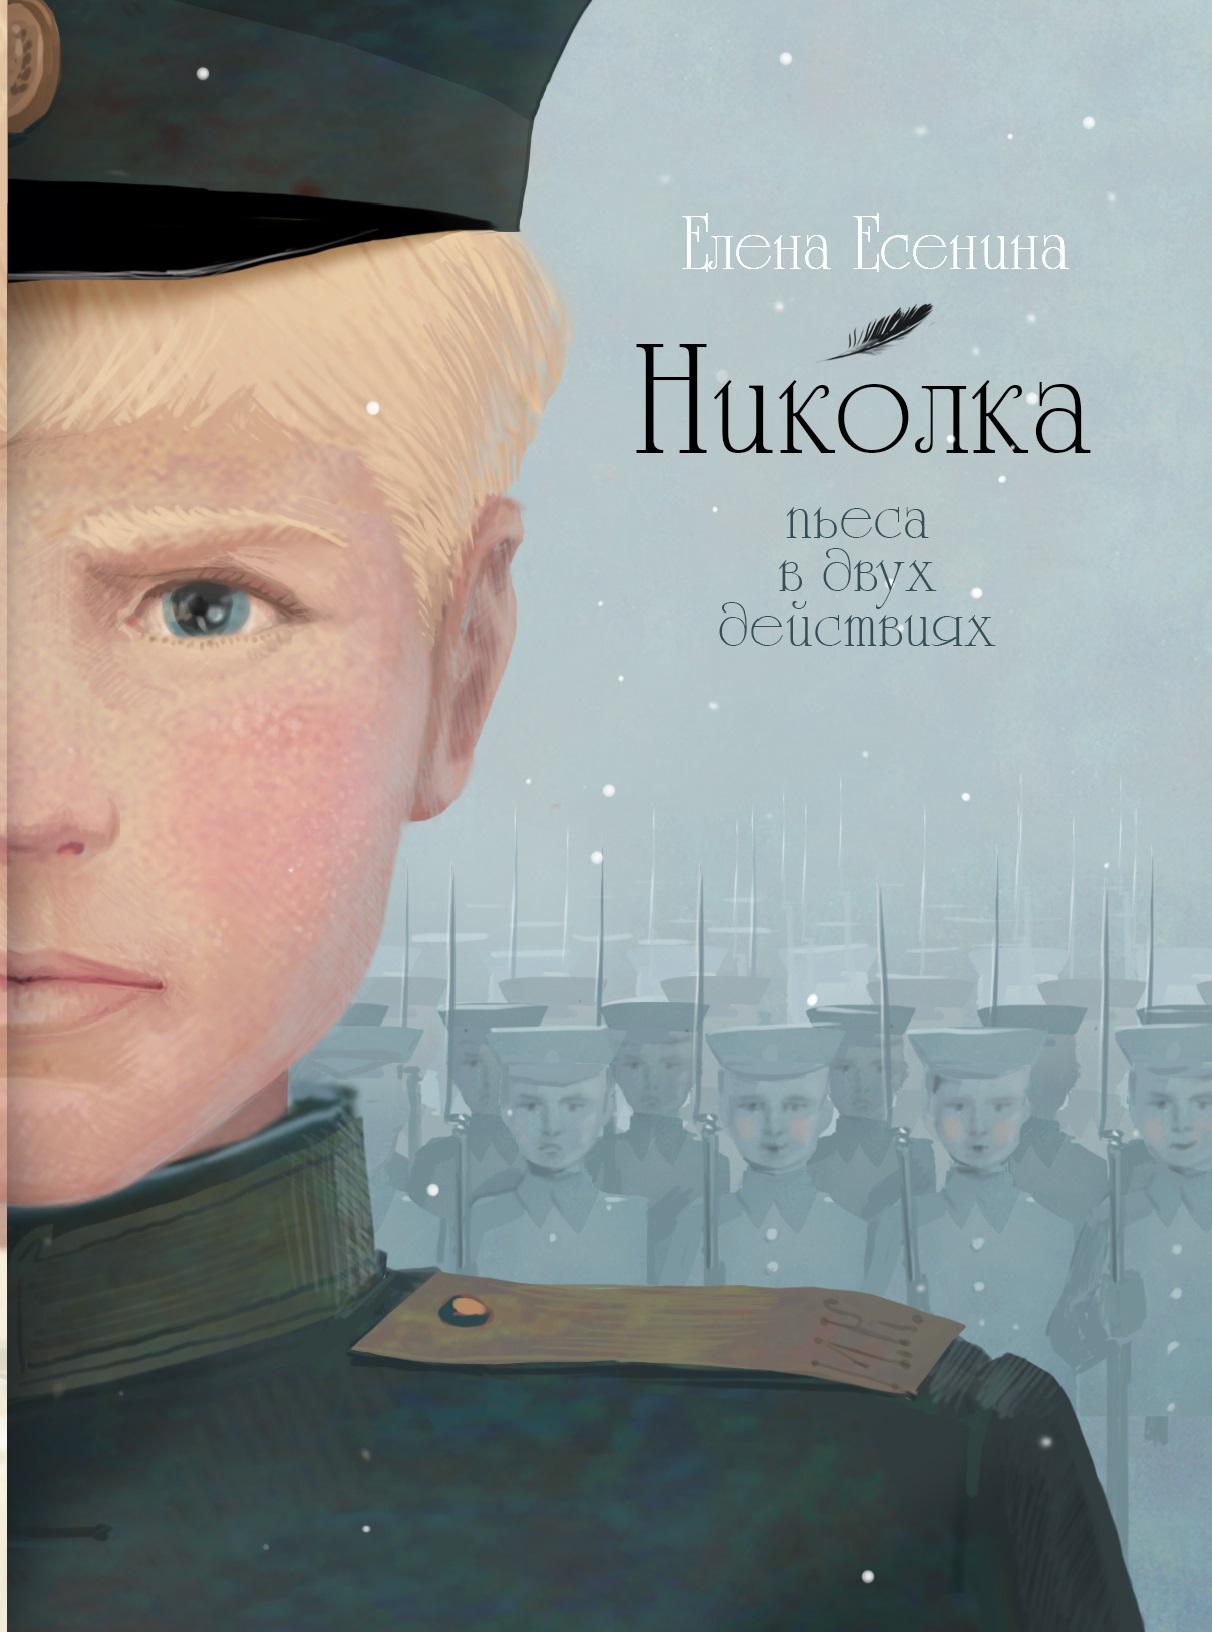 Николка Book Cover